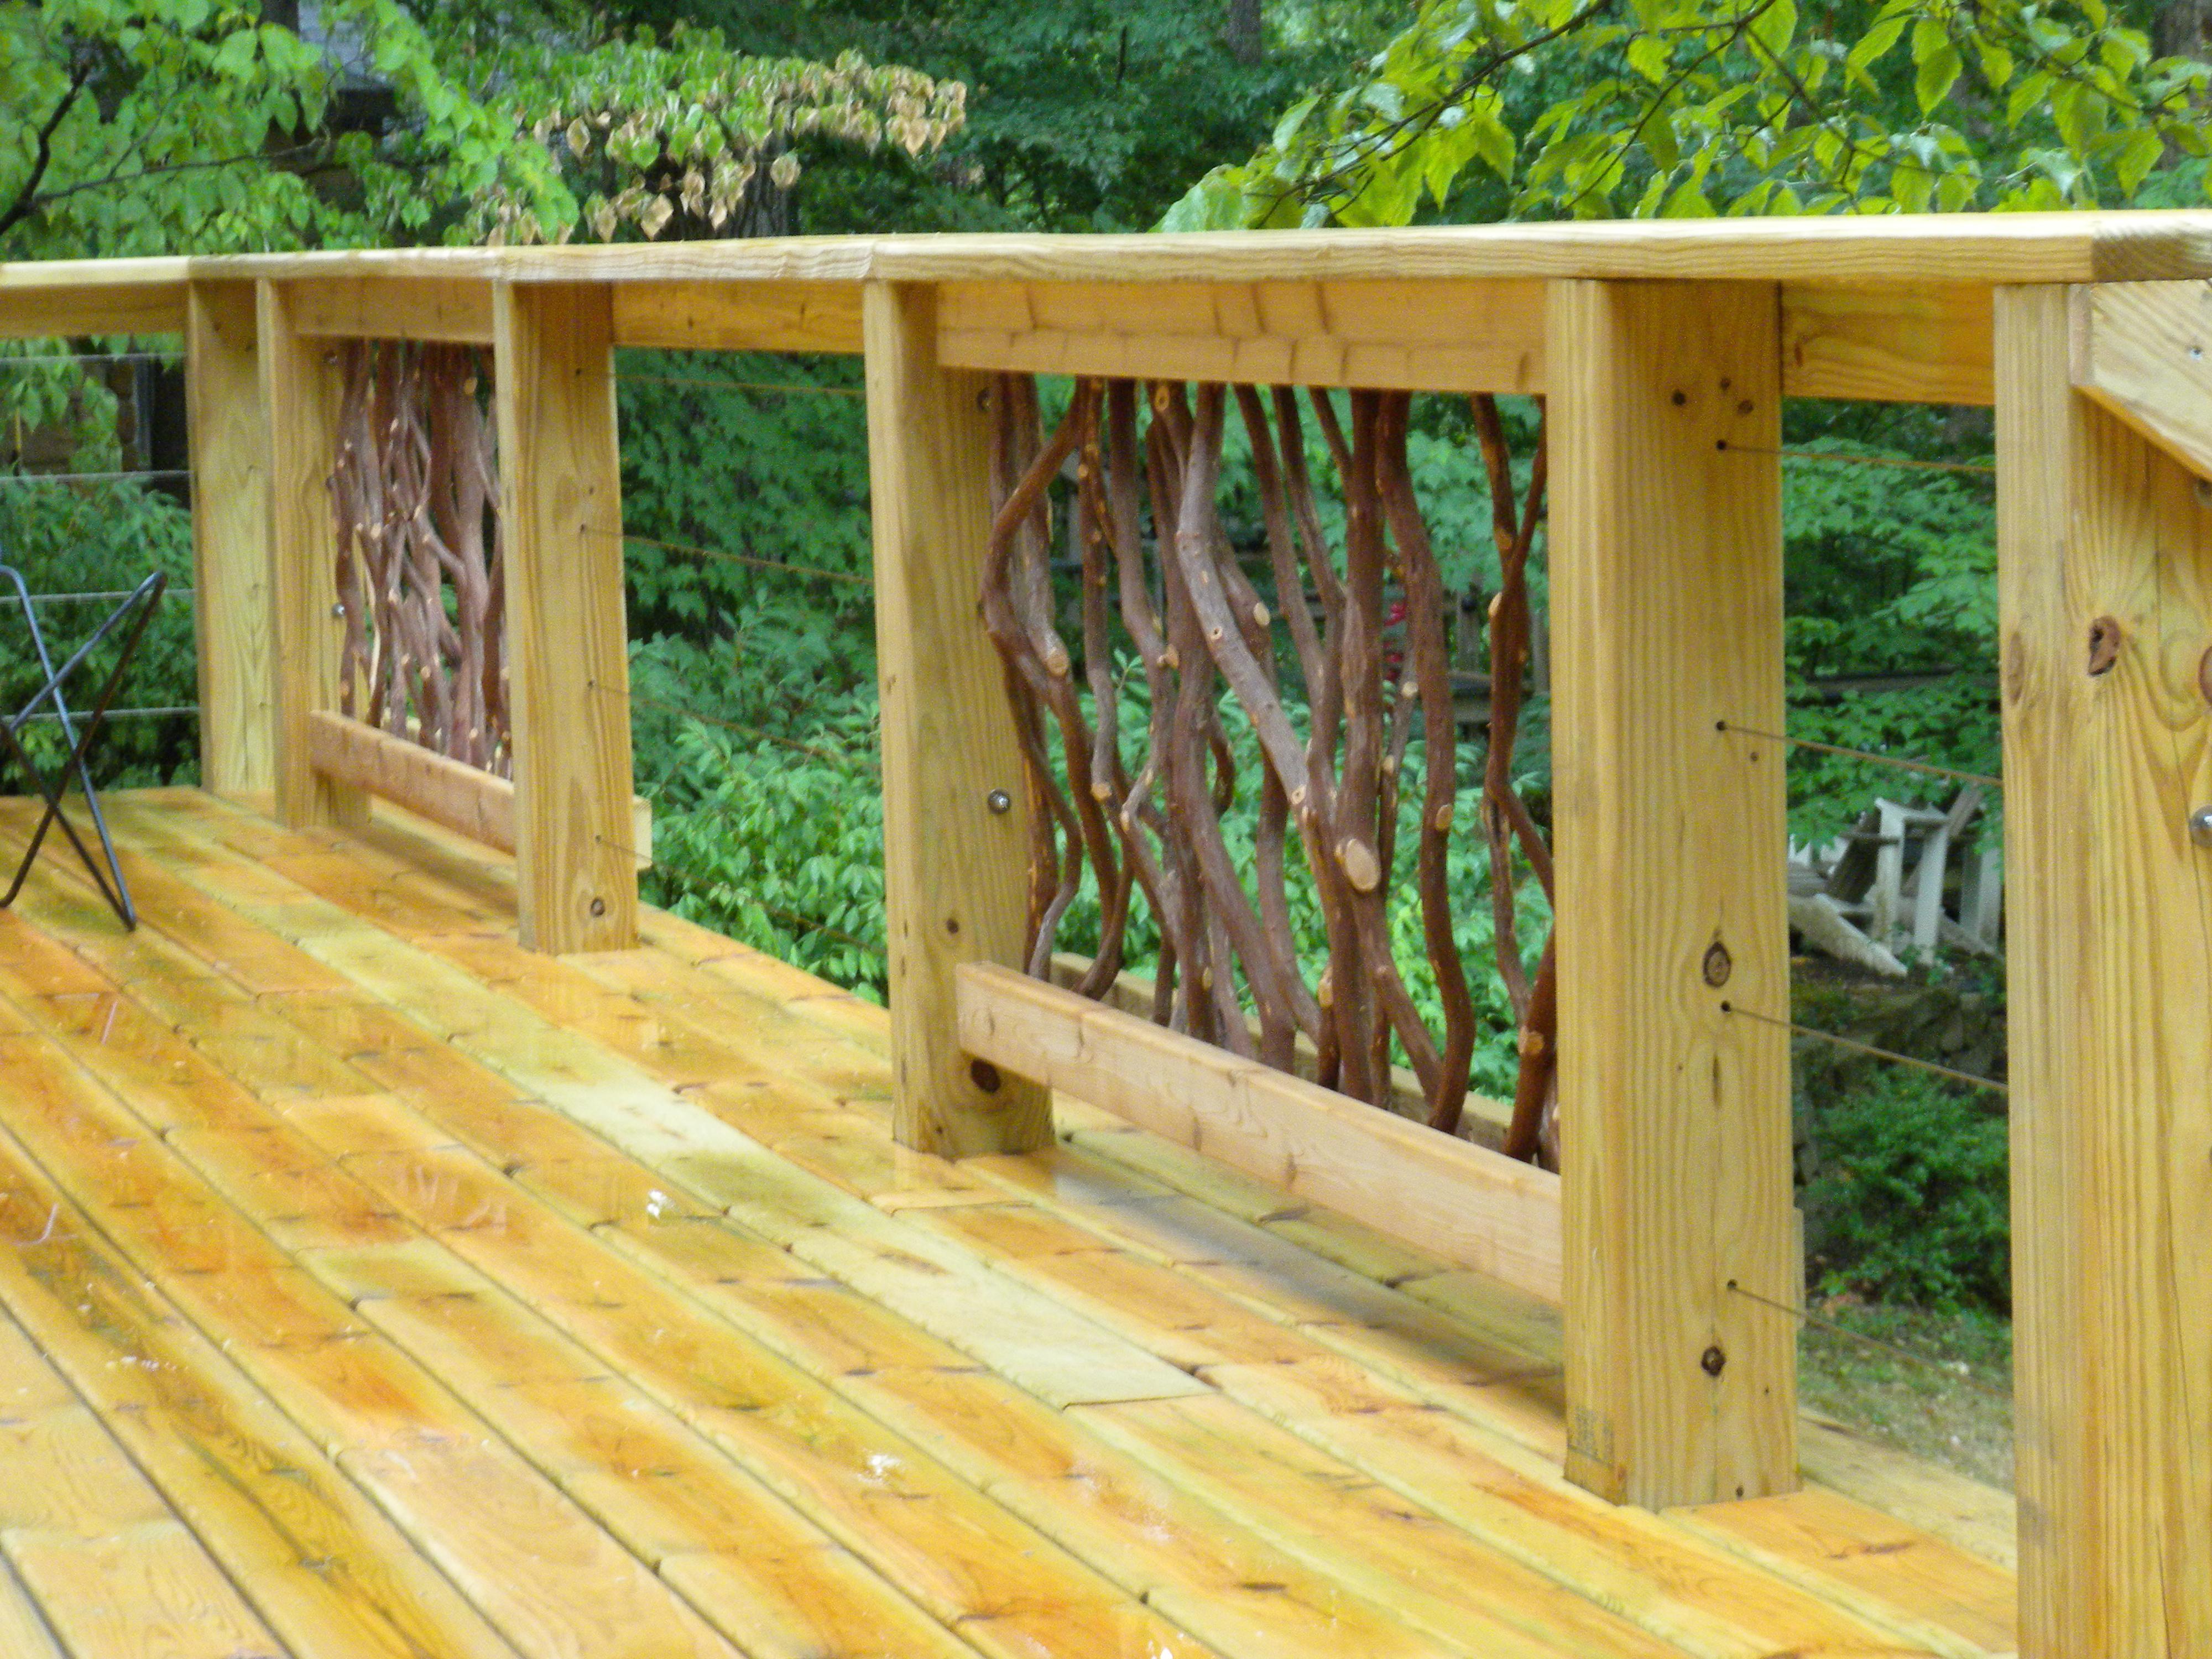 Cable Railing and Branch Handrail Idea | Deck Railing Ideas